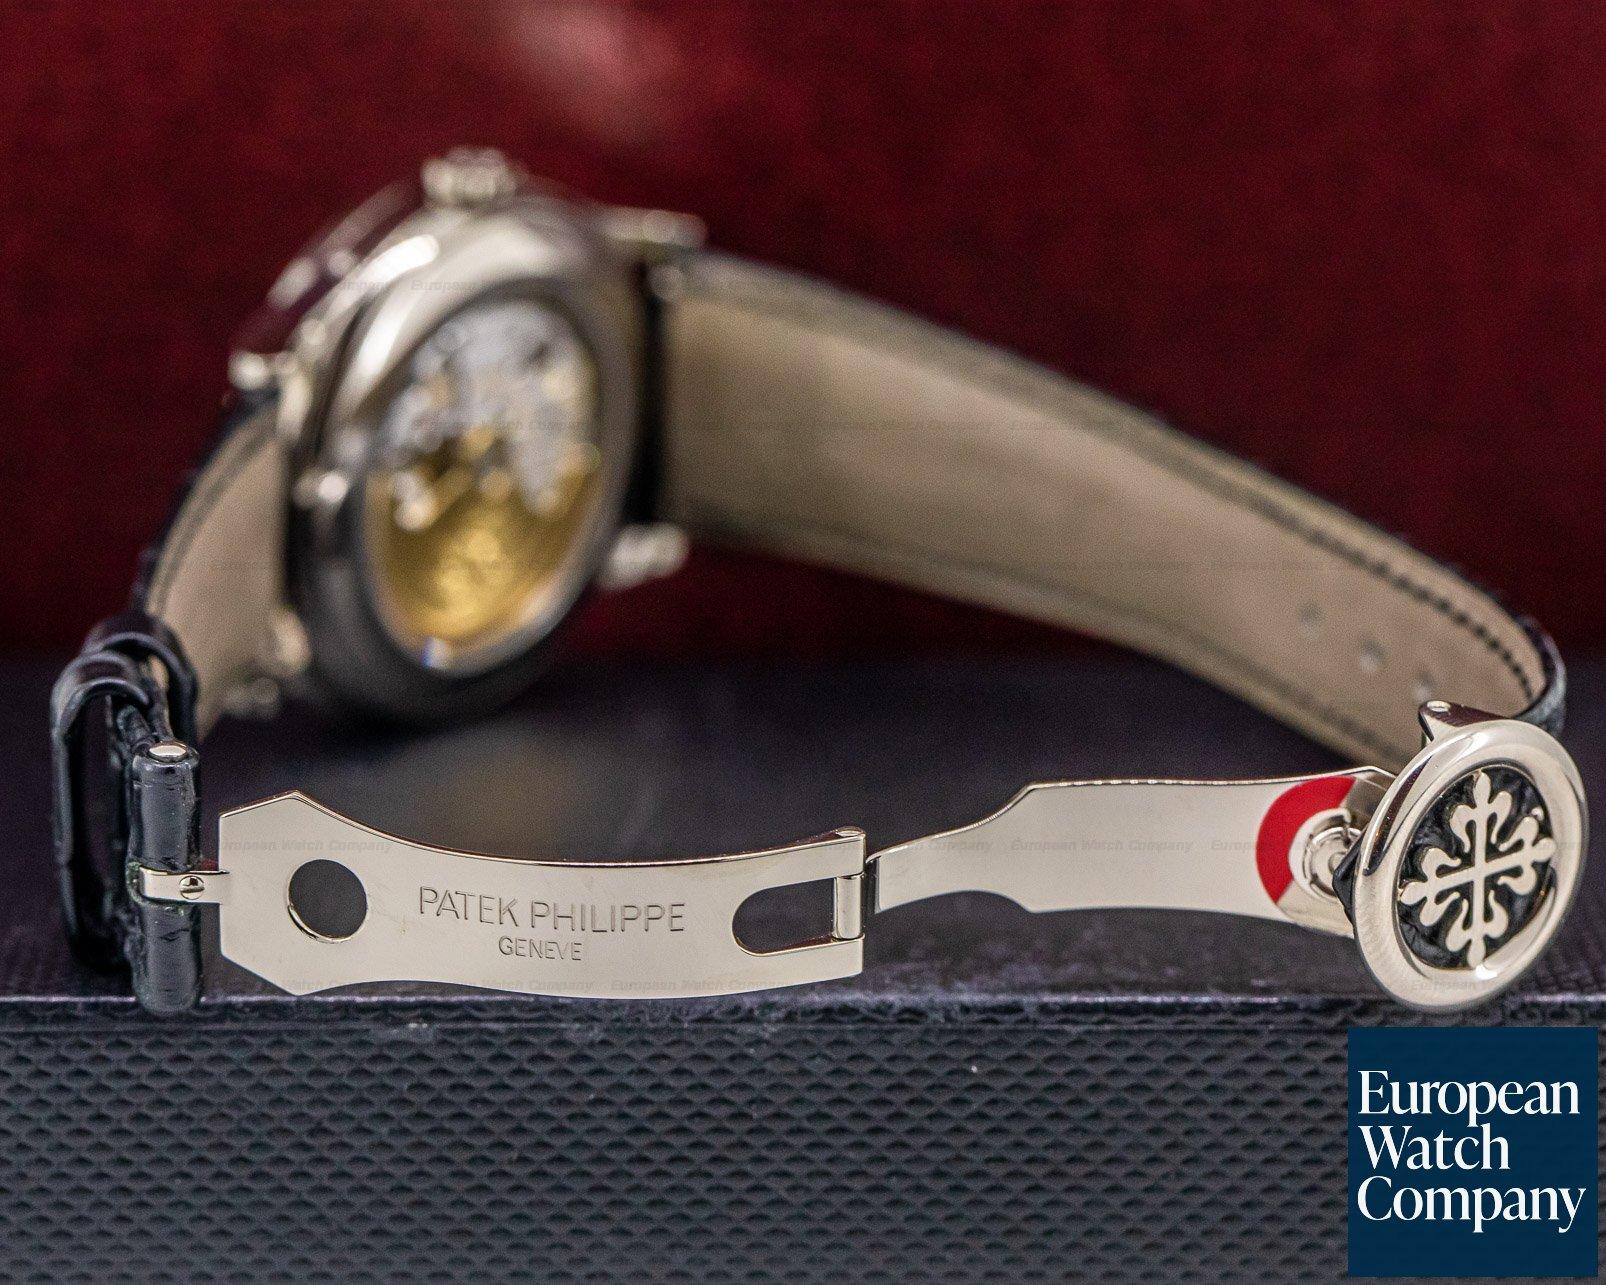 Patek Philippe 5396G-014 Annual Calendar White Gold Grey Dial